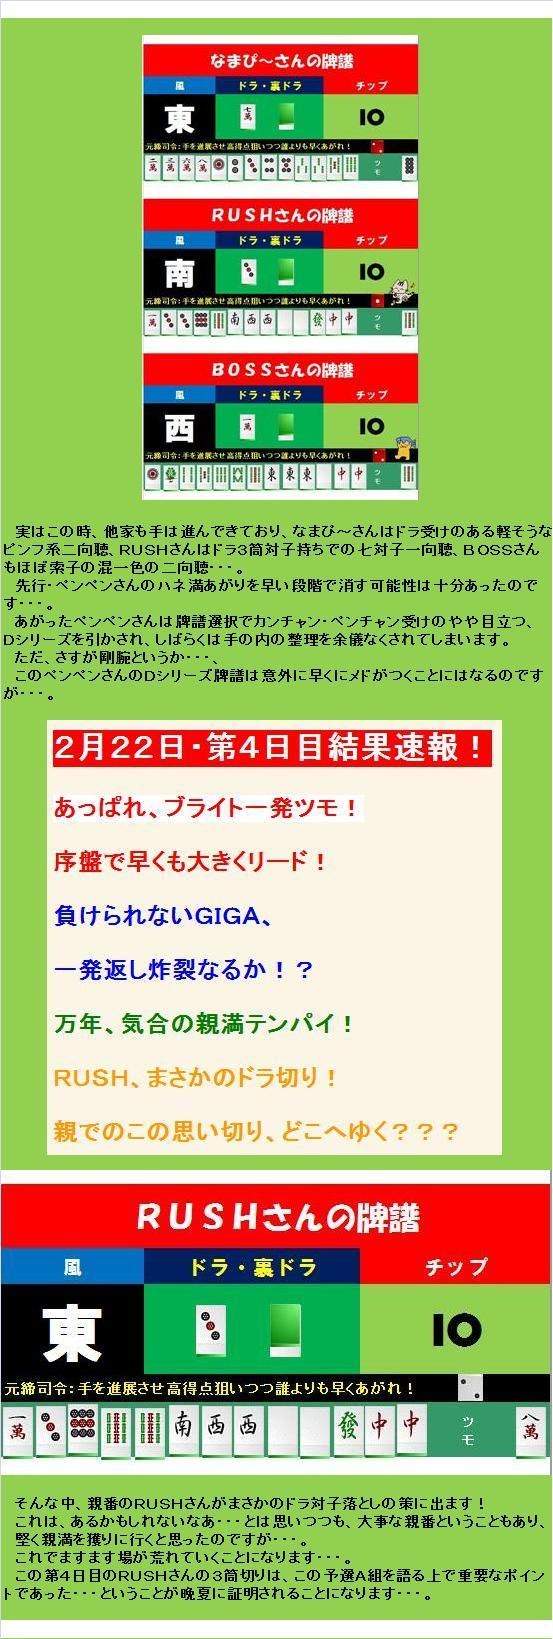 20100226・A組回顧04.jpg